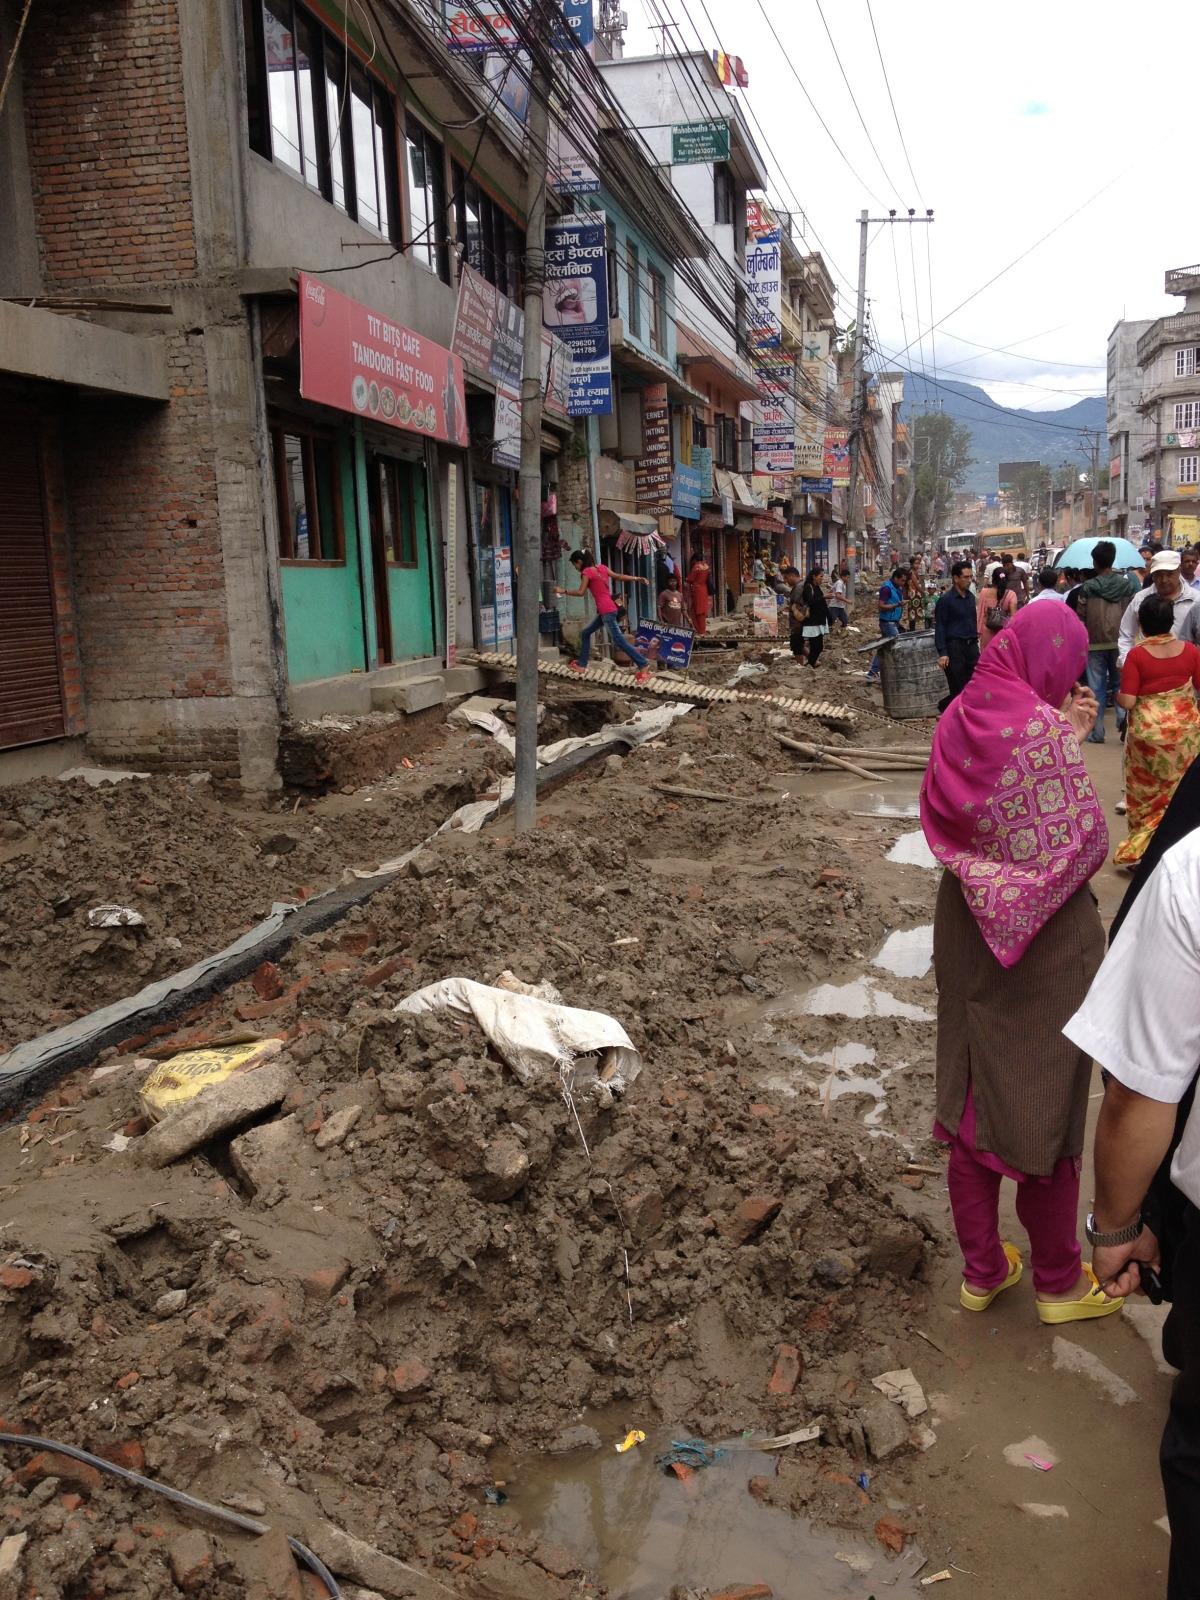 Torn up streets and sidewalks throughout Kathmandu